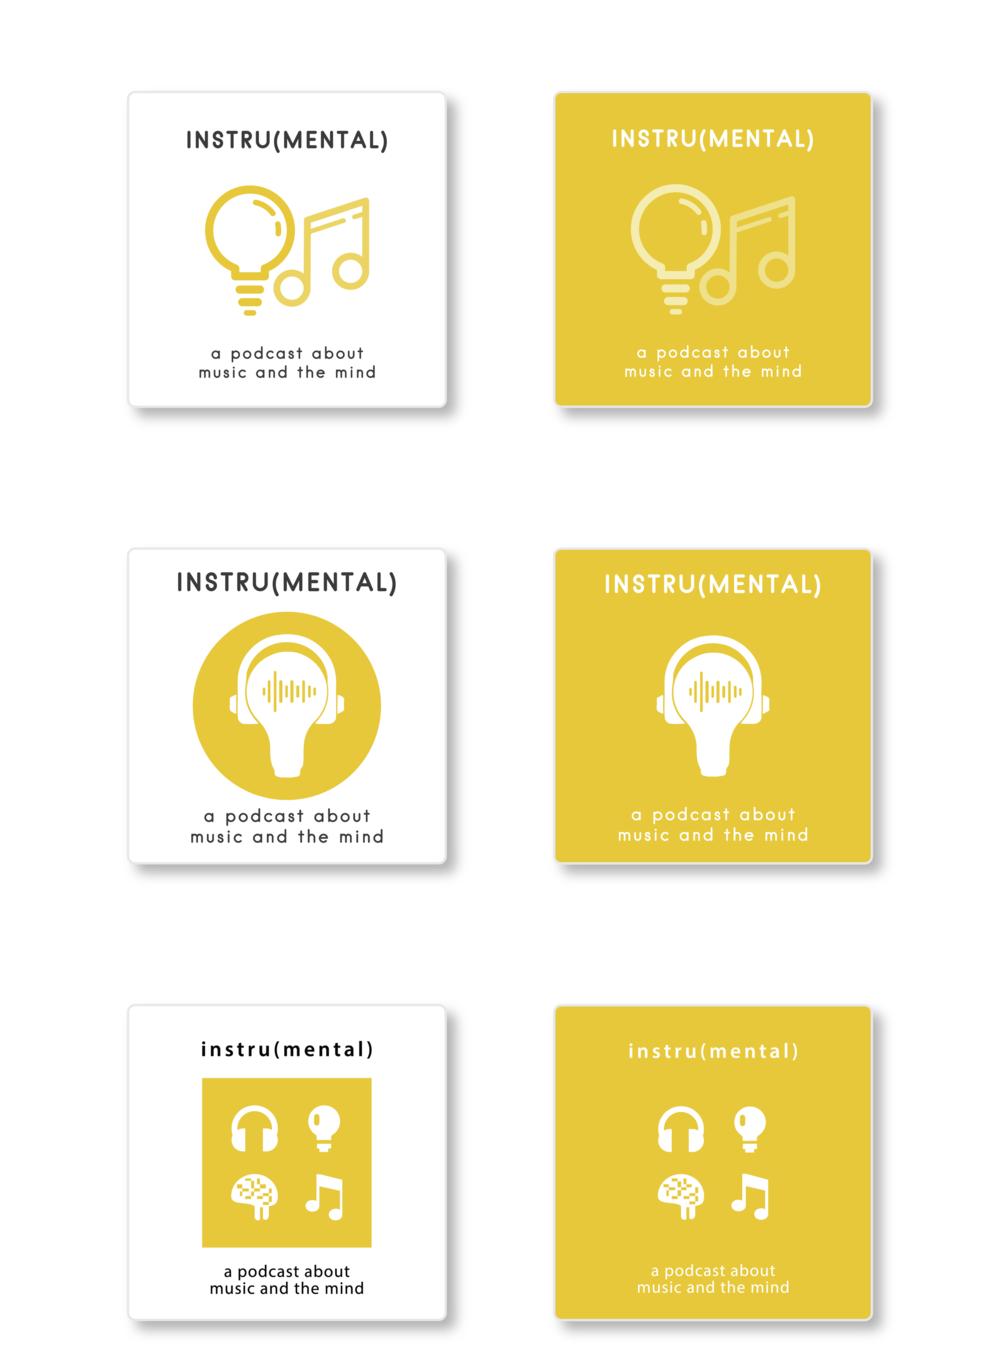 Instru(mental) Podcast's Logo Design — Cheyenne Varner